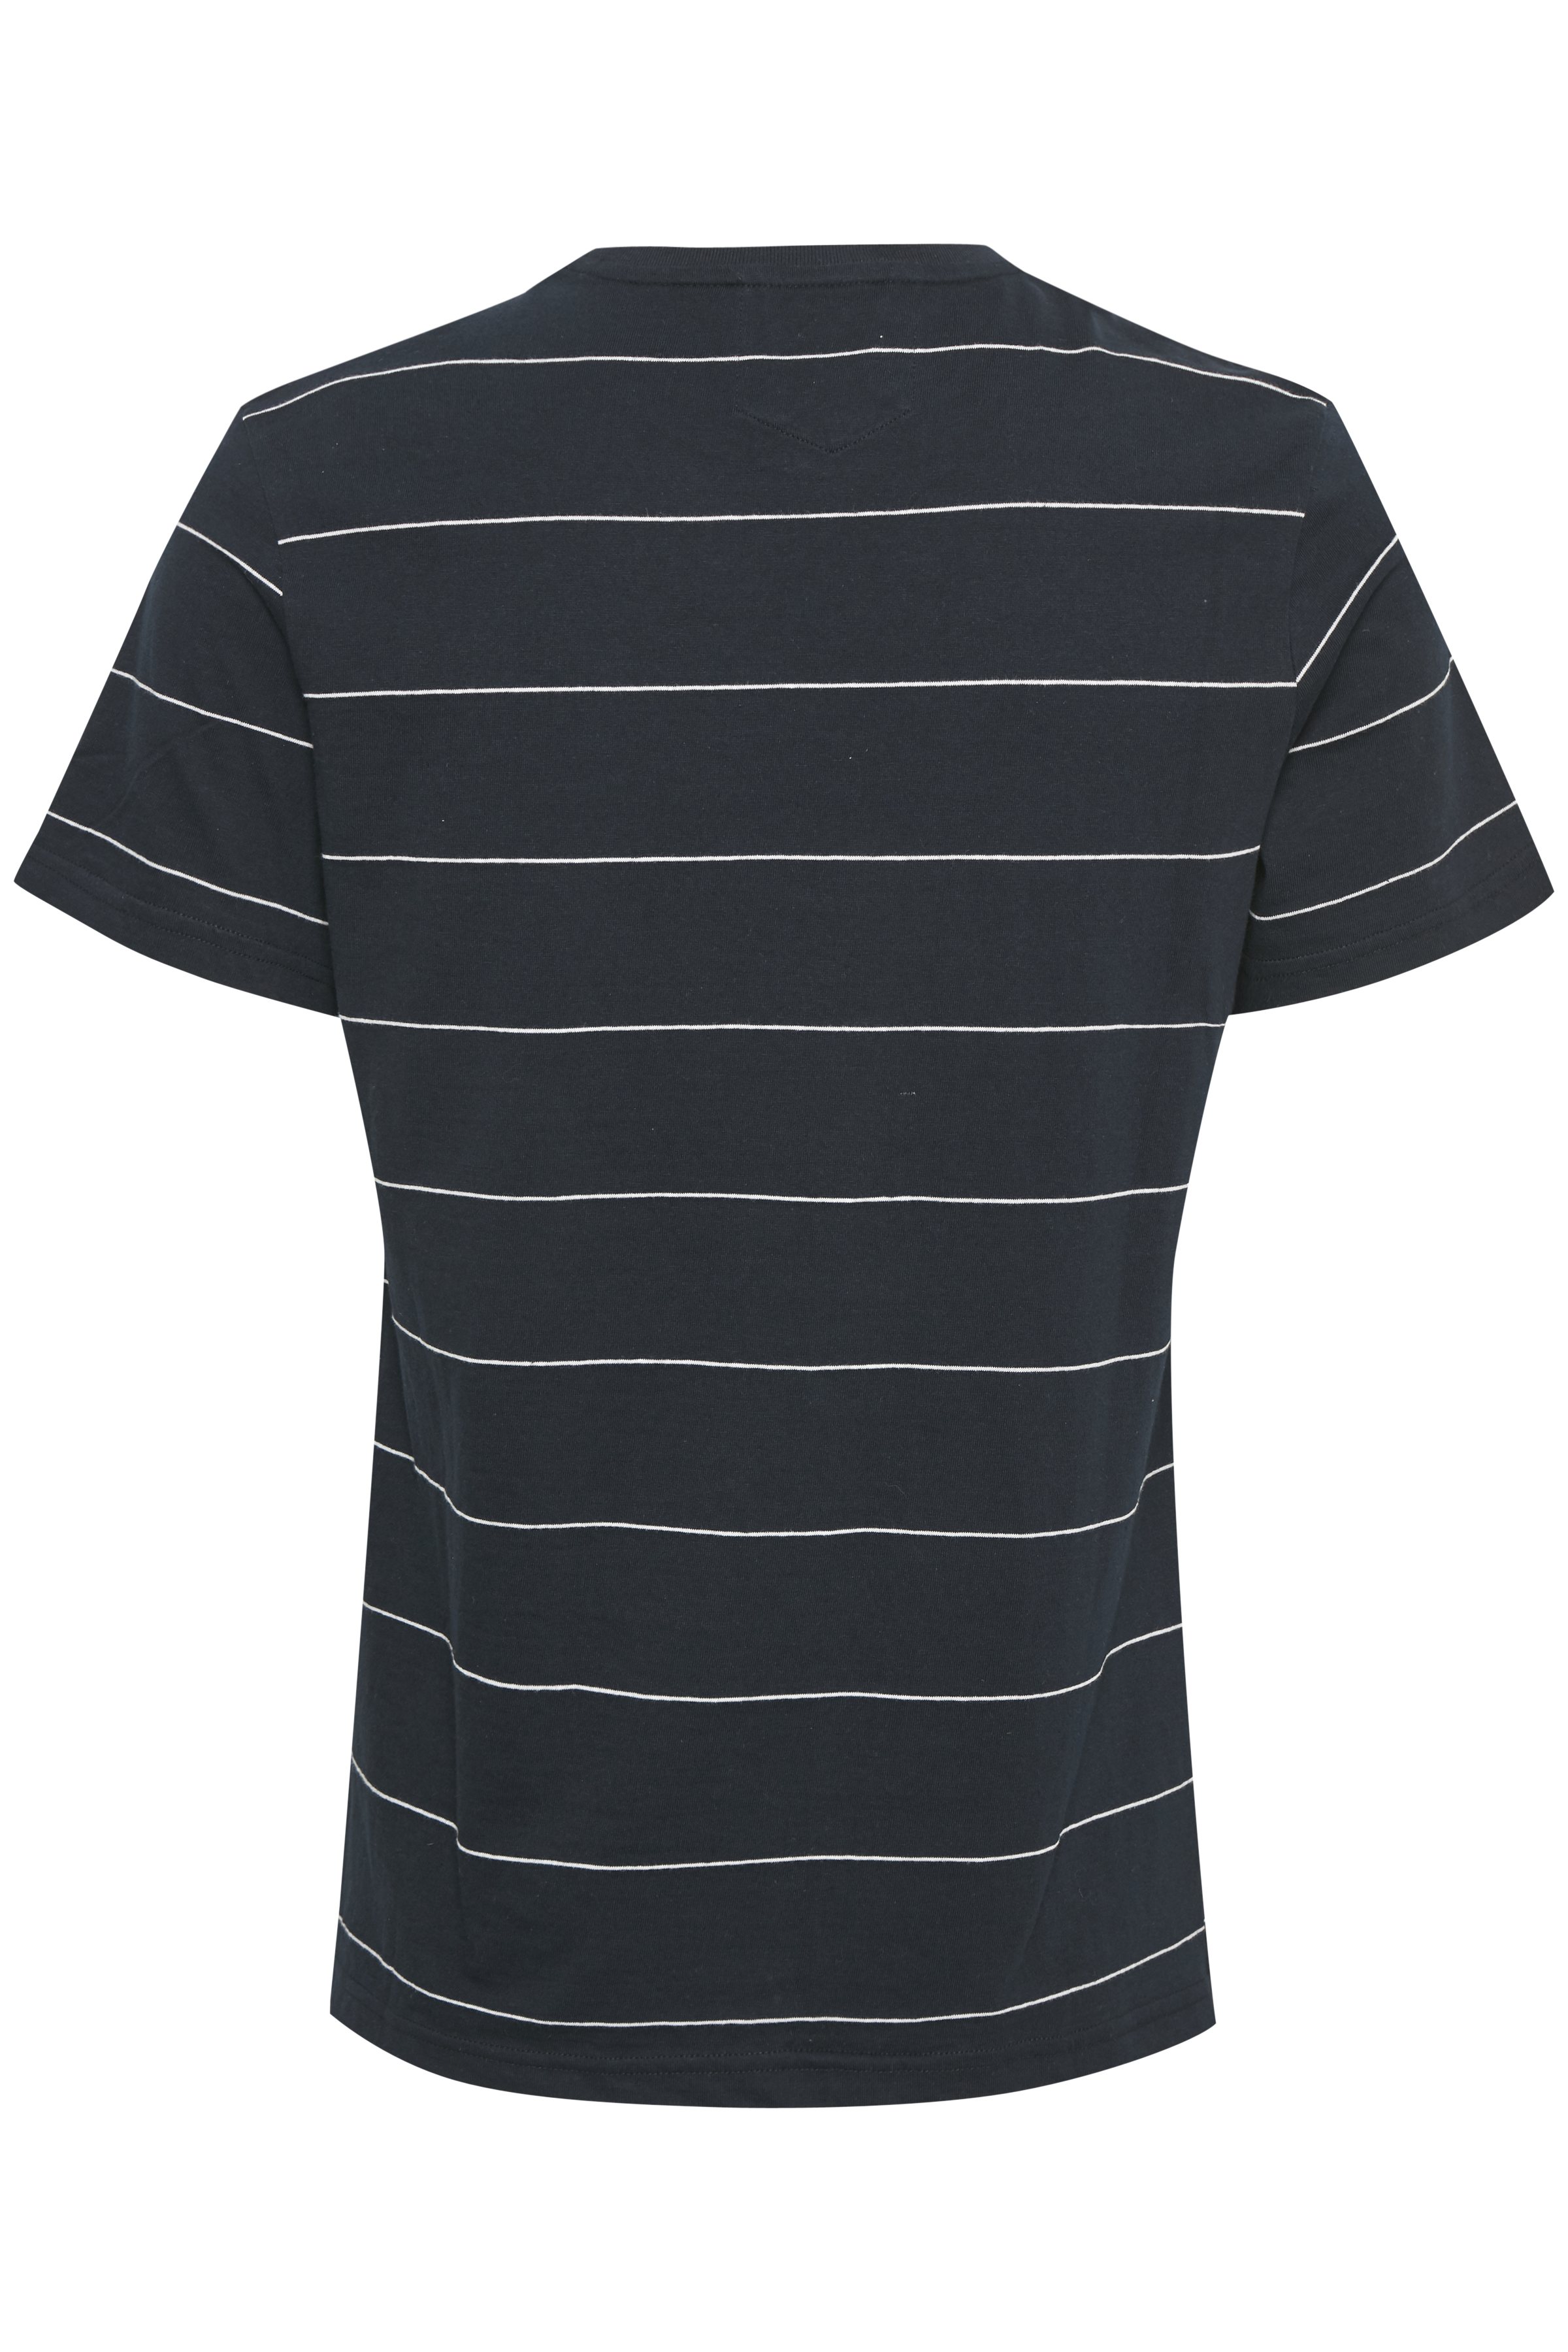 Night Navy T-Shirt fra Casual Friday – Køb Night Navy T-Shirt fra str. S-3XL her